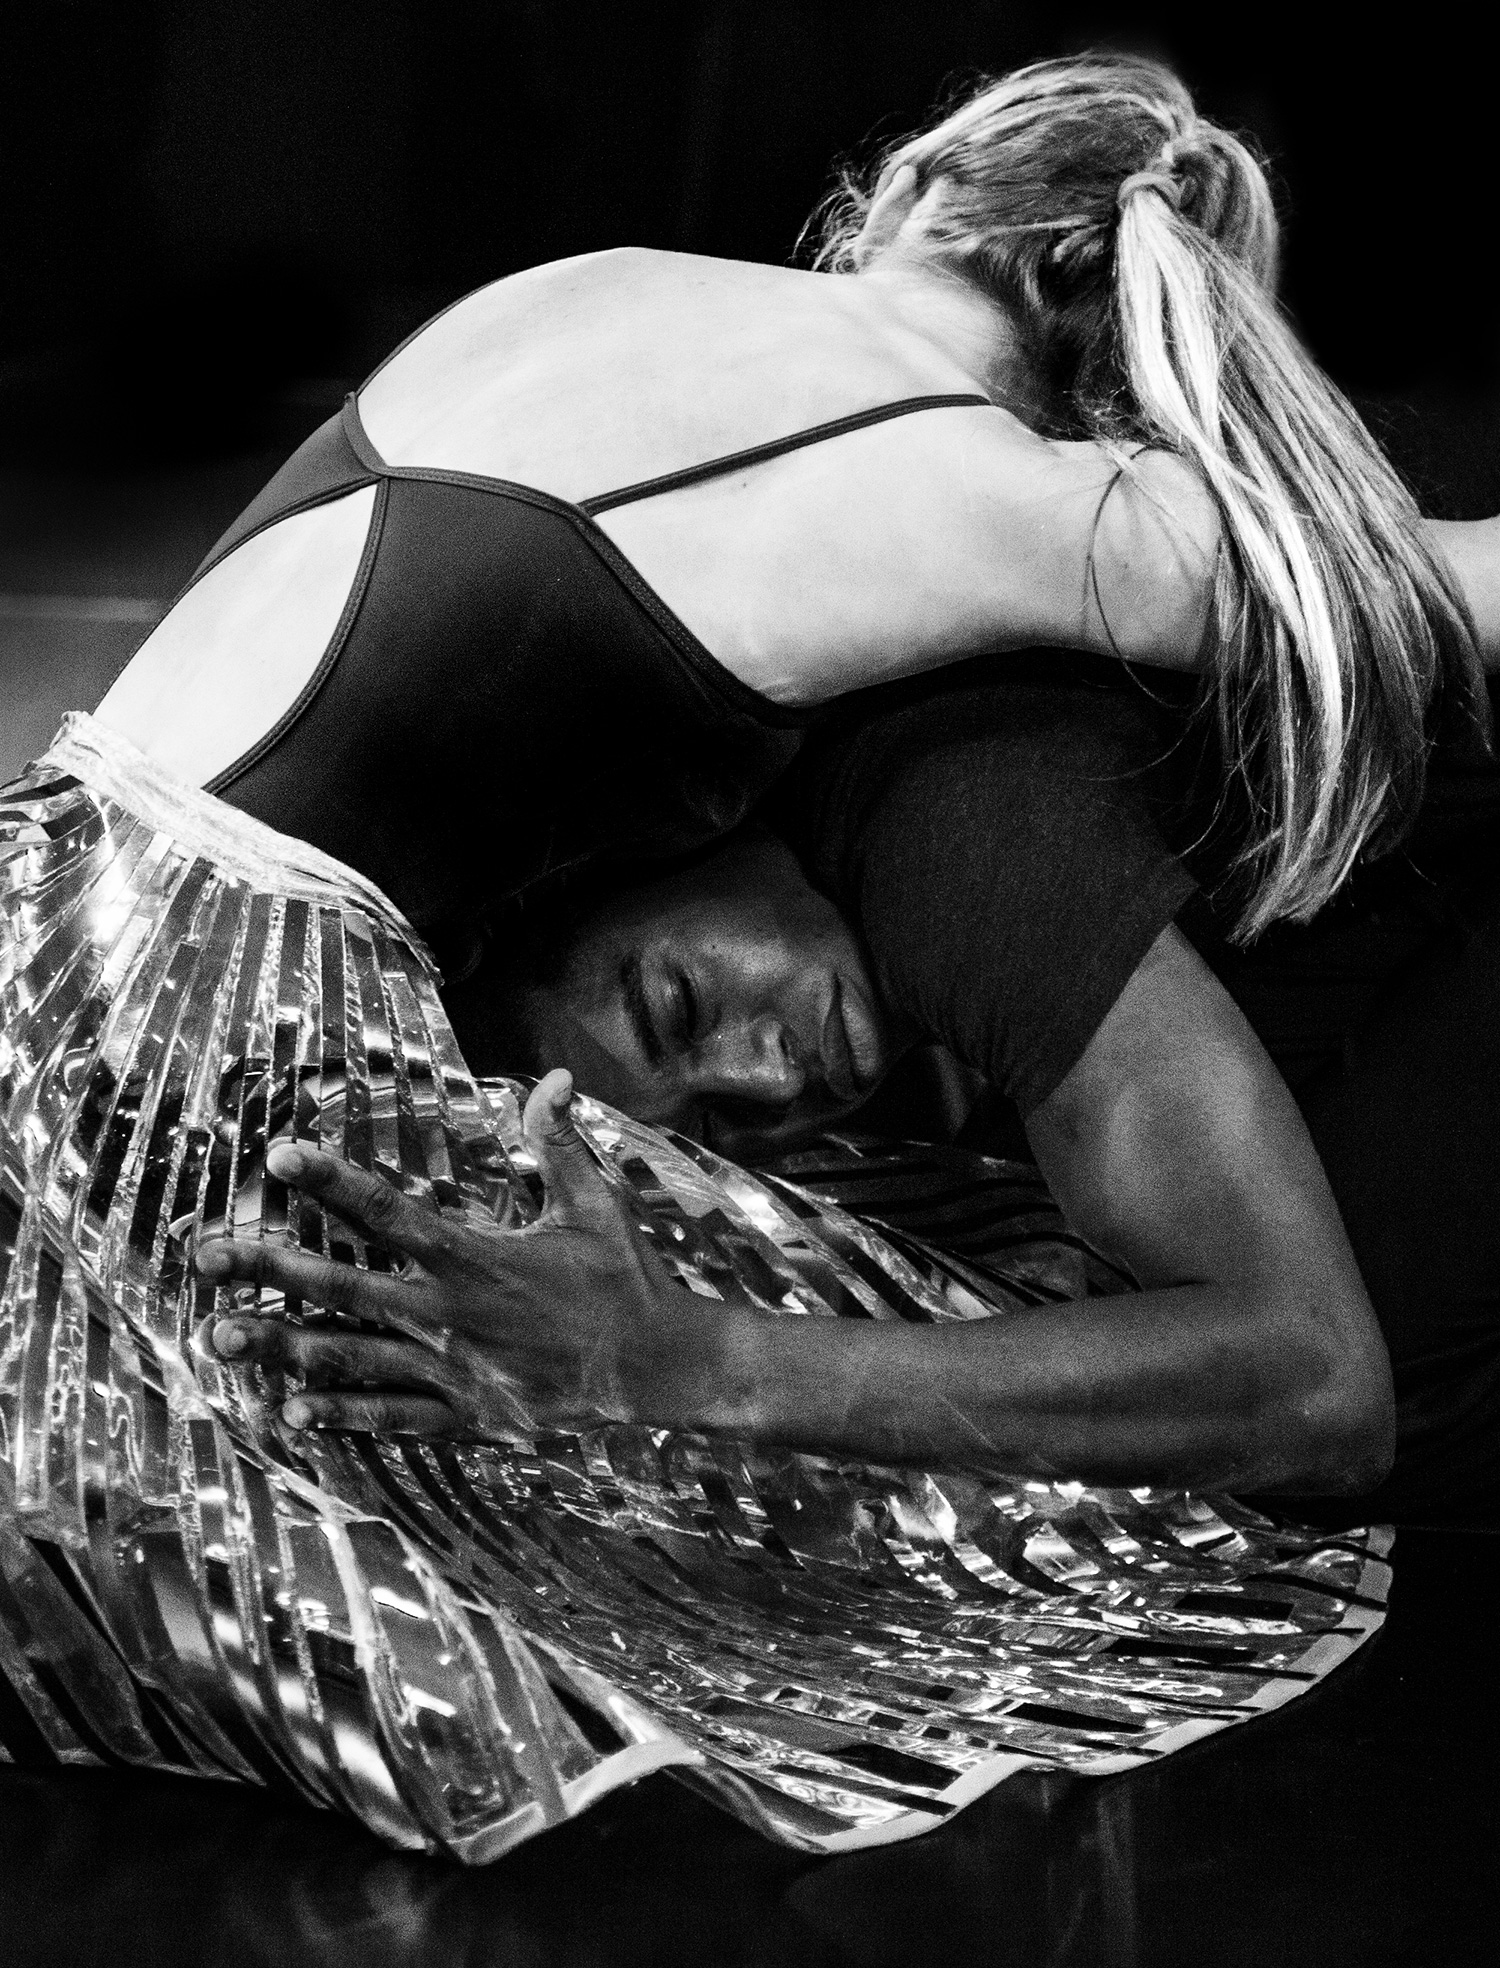 nyc_ballet_x_cartier_050